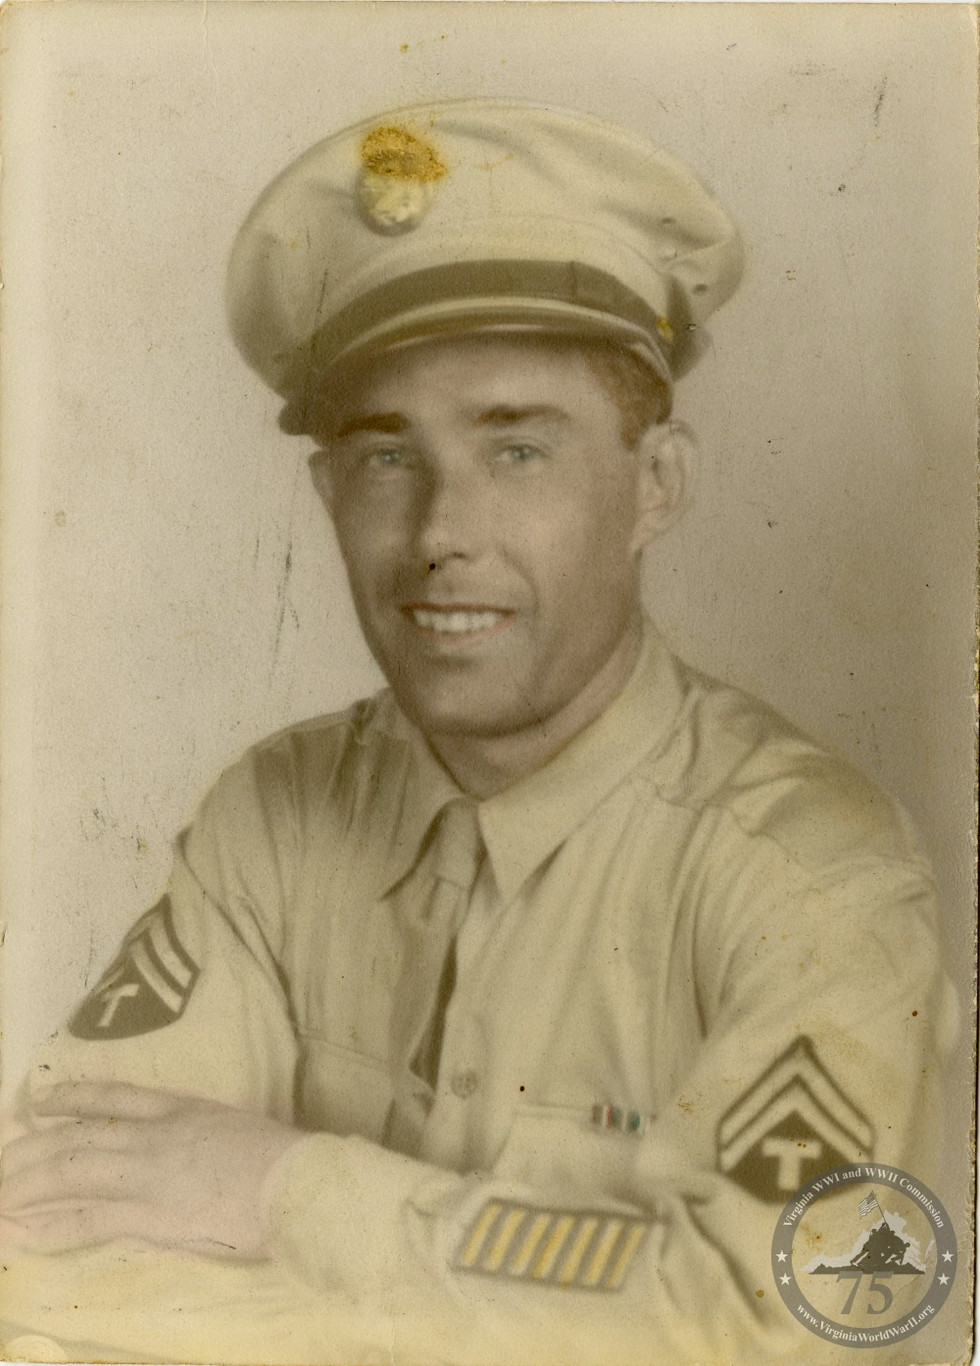 Harris, William Thomas - WWII Photo